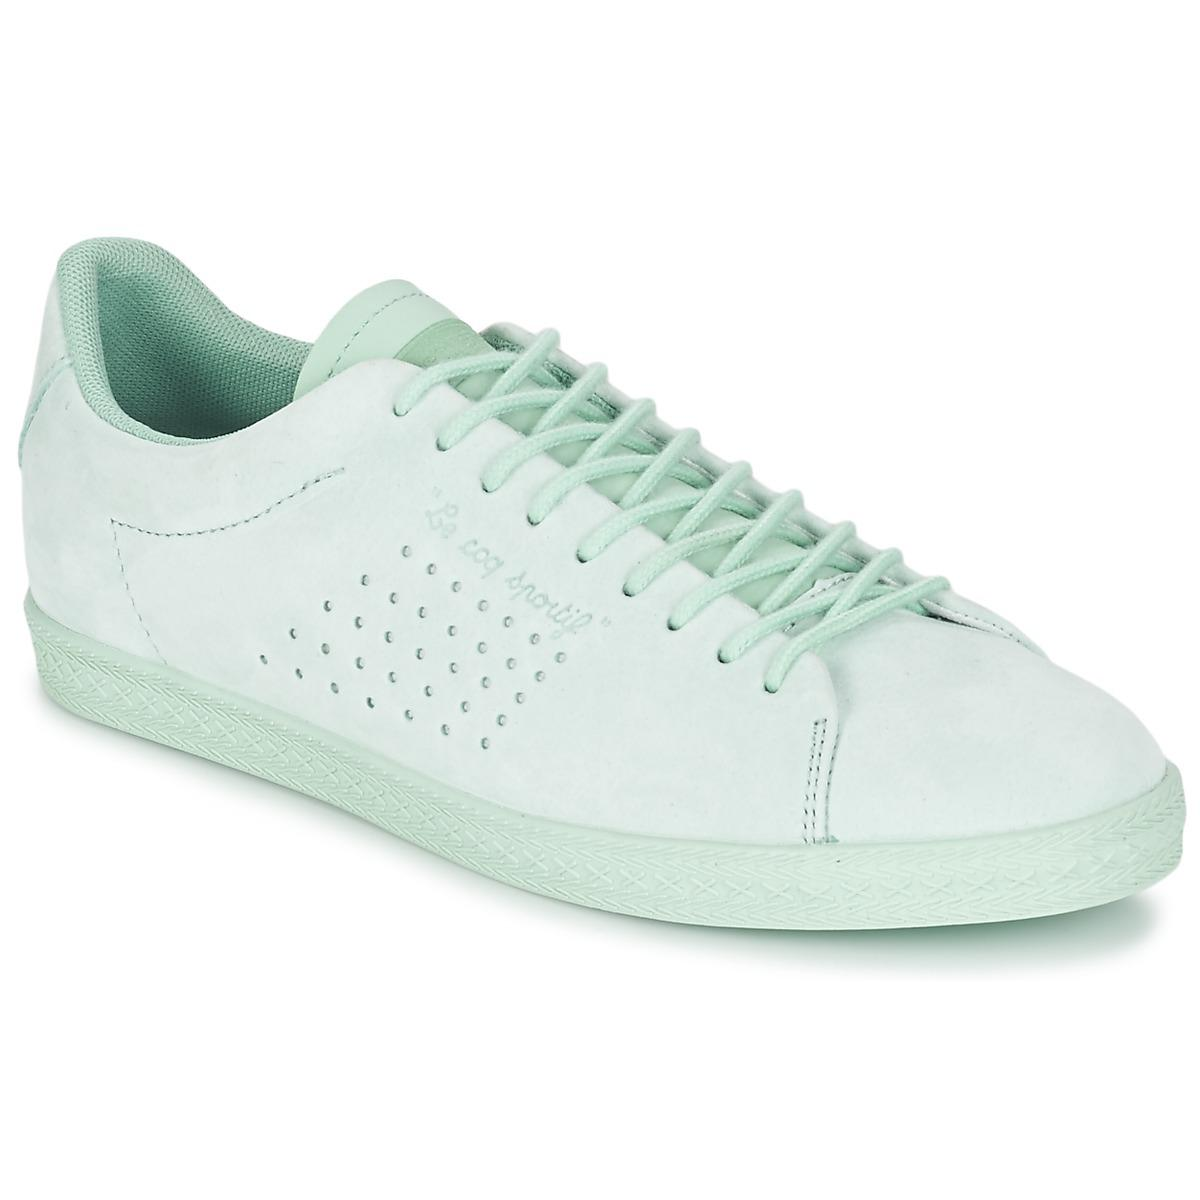 5367e50fa6814 black coq le green shoes womens sportif dXxrRqBx in disposal ...